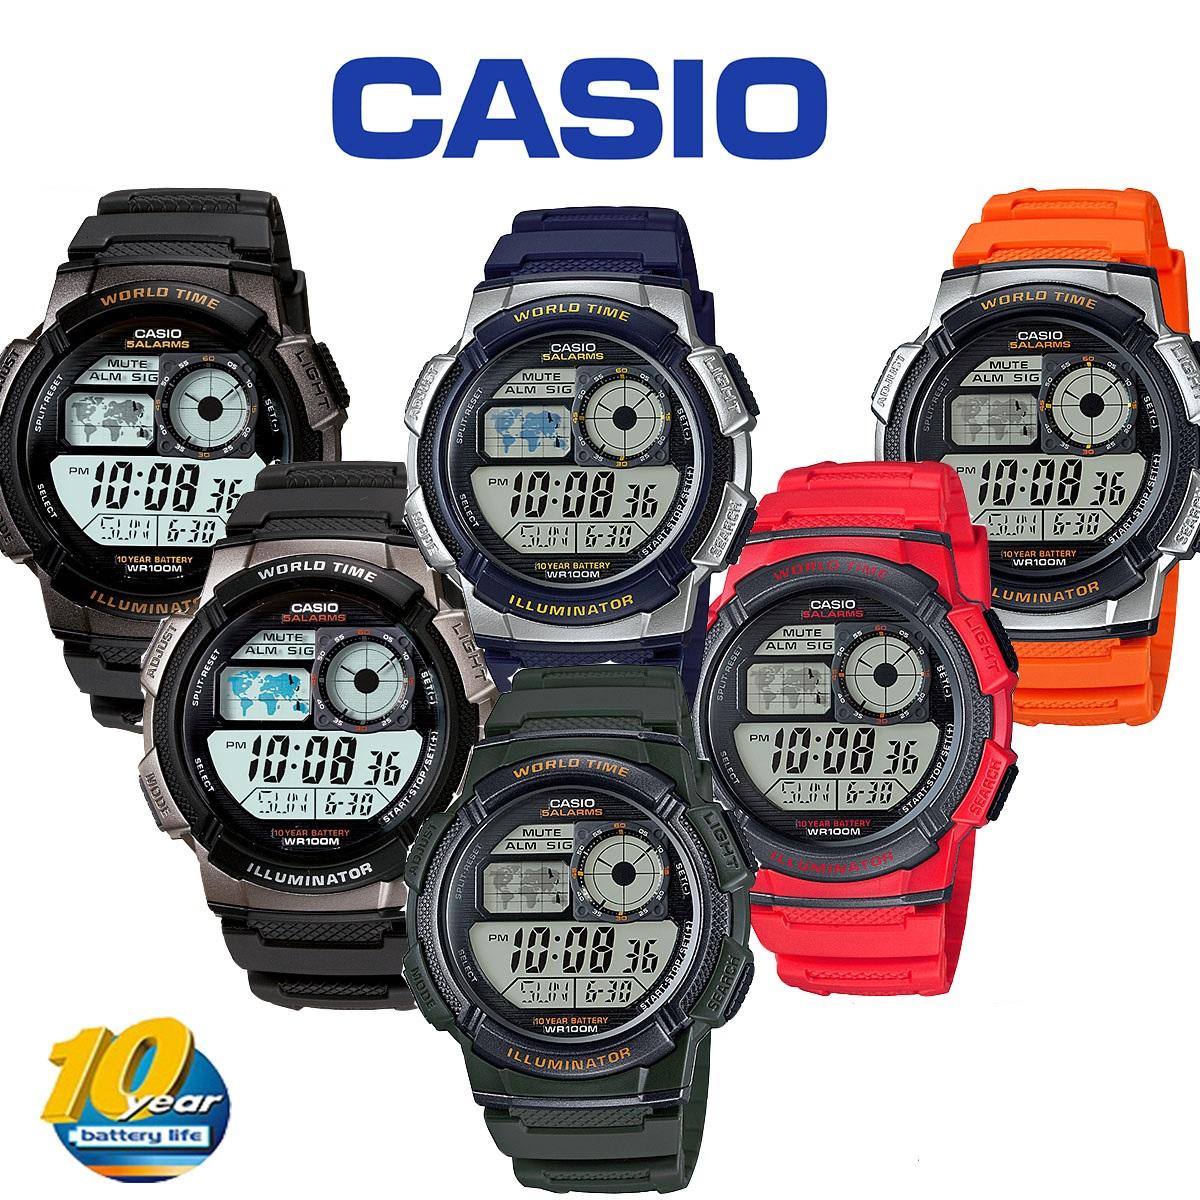 CASIO ORI AE1000W AE1000-W AE-1000W AE-1000-W 1A 2A 3A 4A 1B 2B 3B 4B